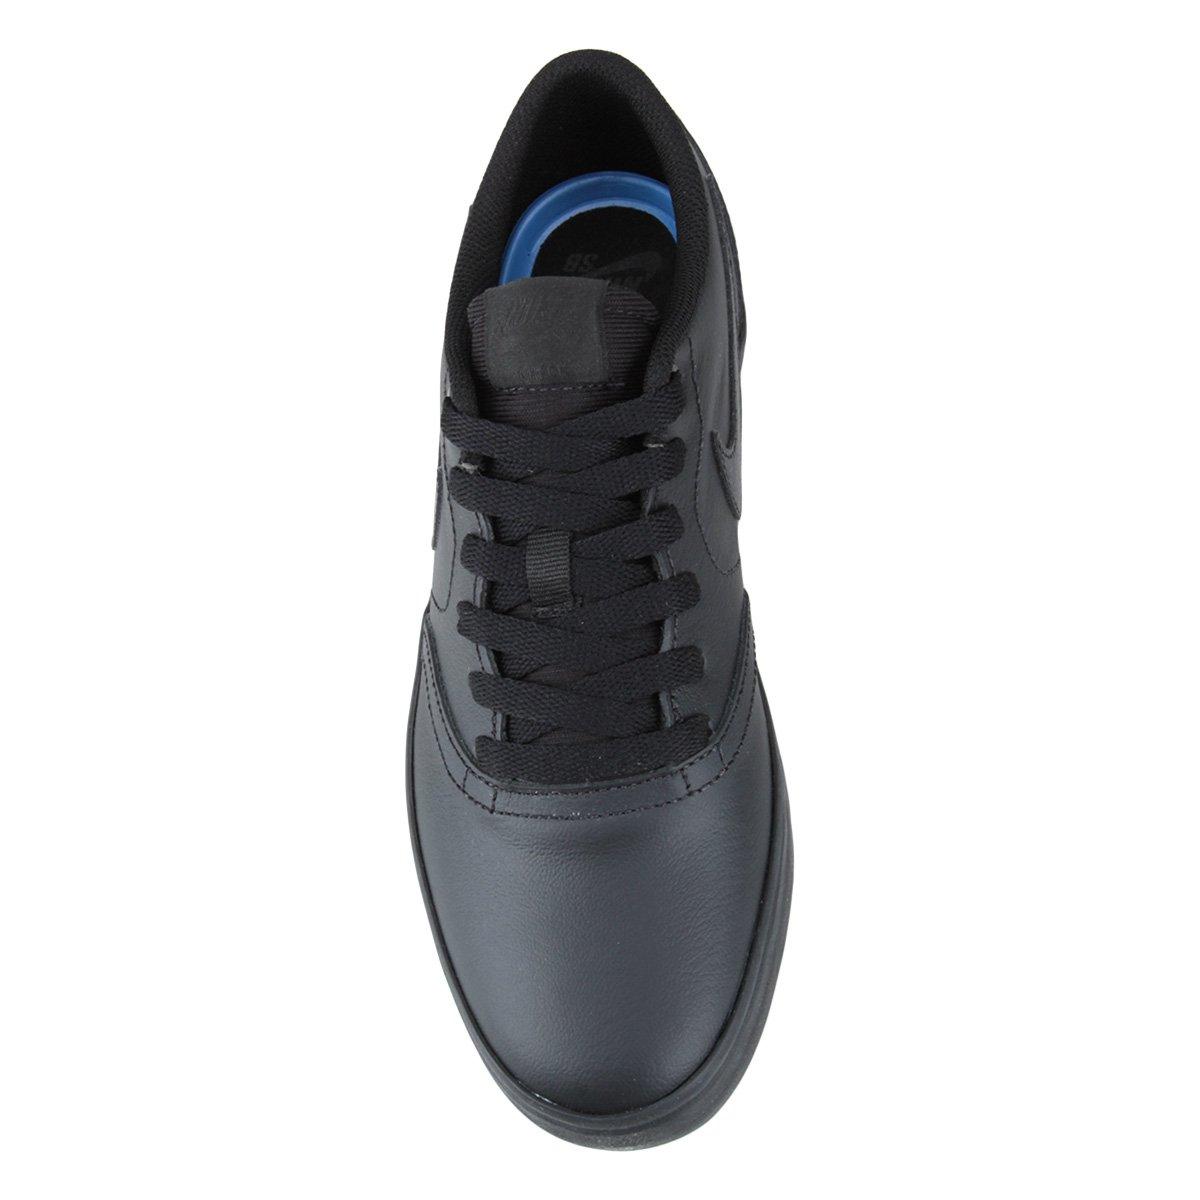 best website ae0b6 f4e94 ... Tênis Nike Sb Check Solar Masculino ...